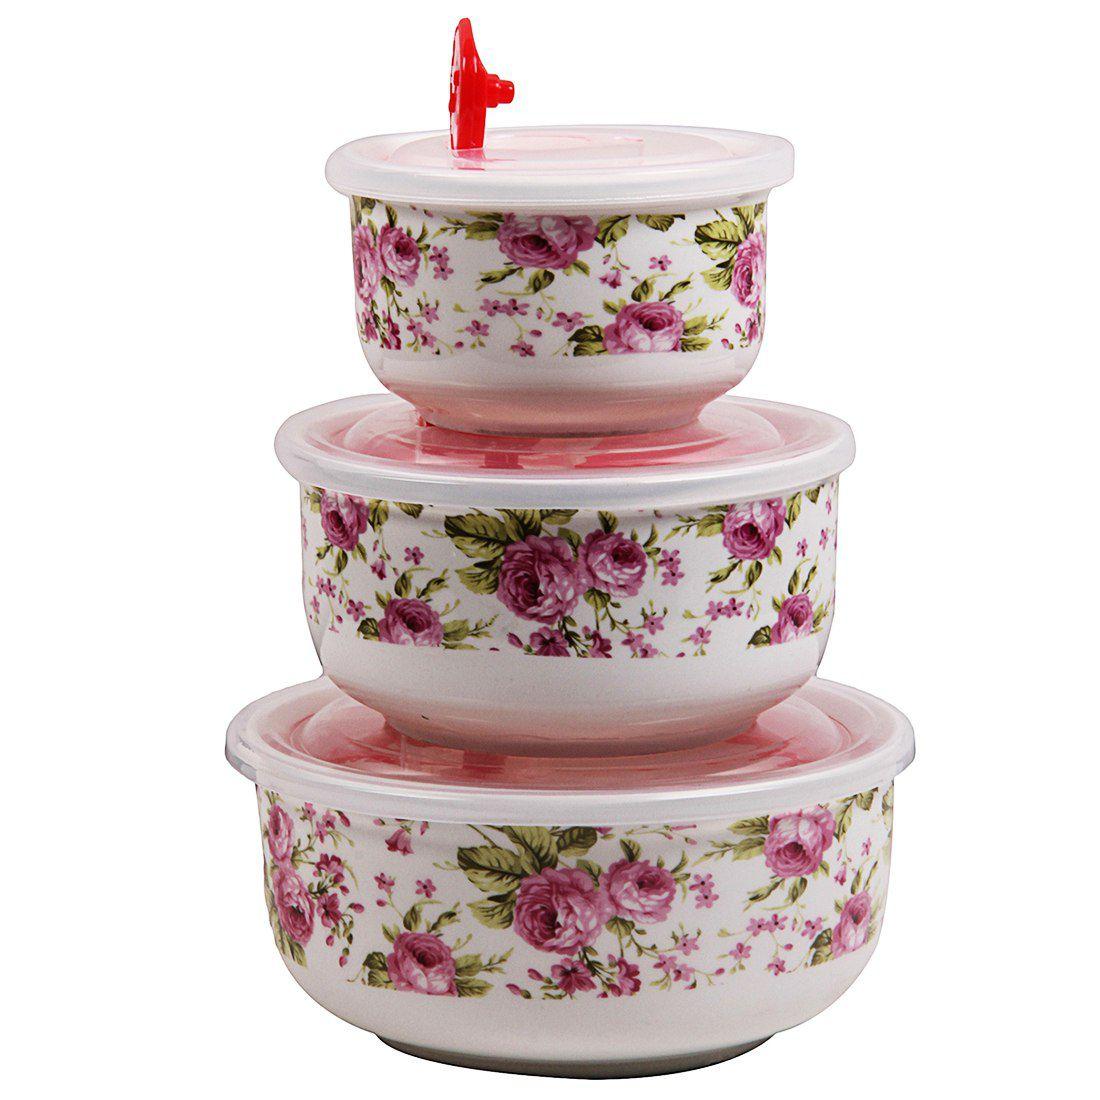 Eloisa Ceramic Serving Bowls Set Of 3 Buy Online At Best Price In